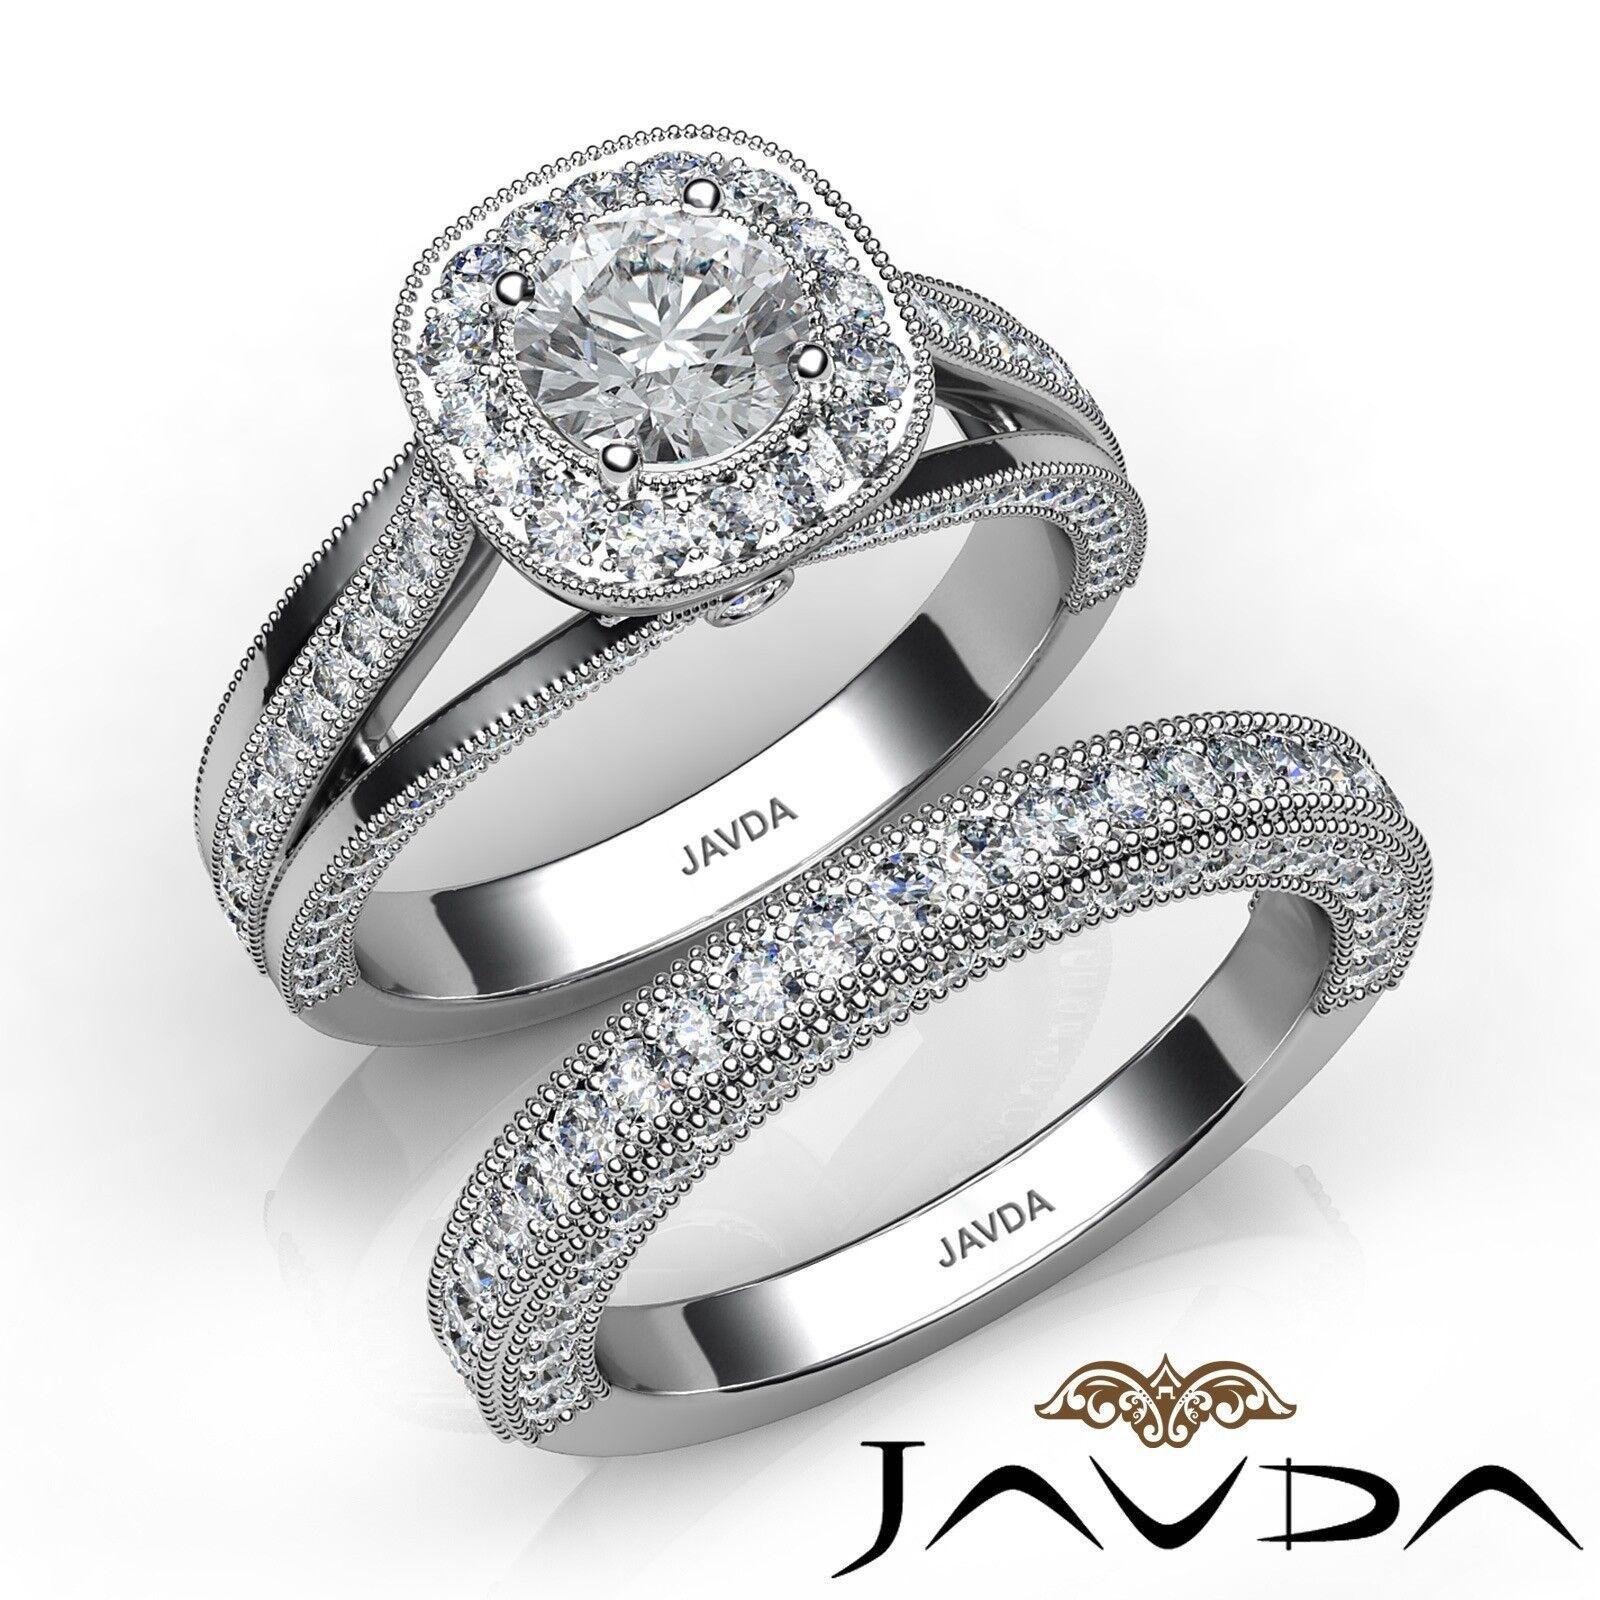 2.2ct Milgrain Bridal Set Halo Pave Round Diamond Engagement Ring GIA E-VS2 Gold